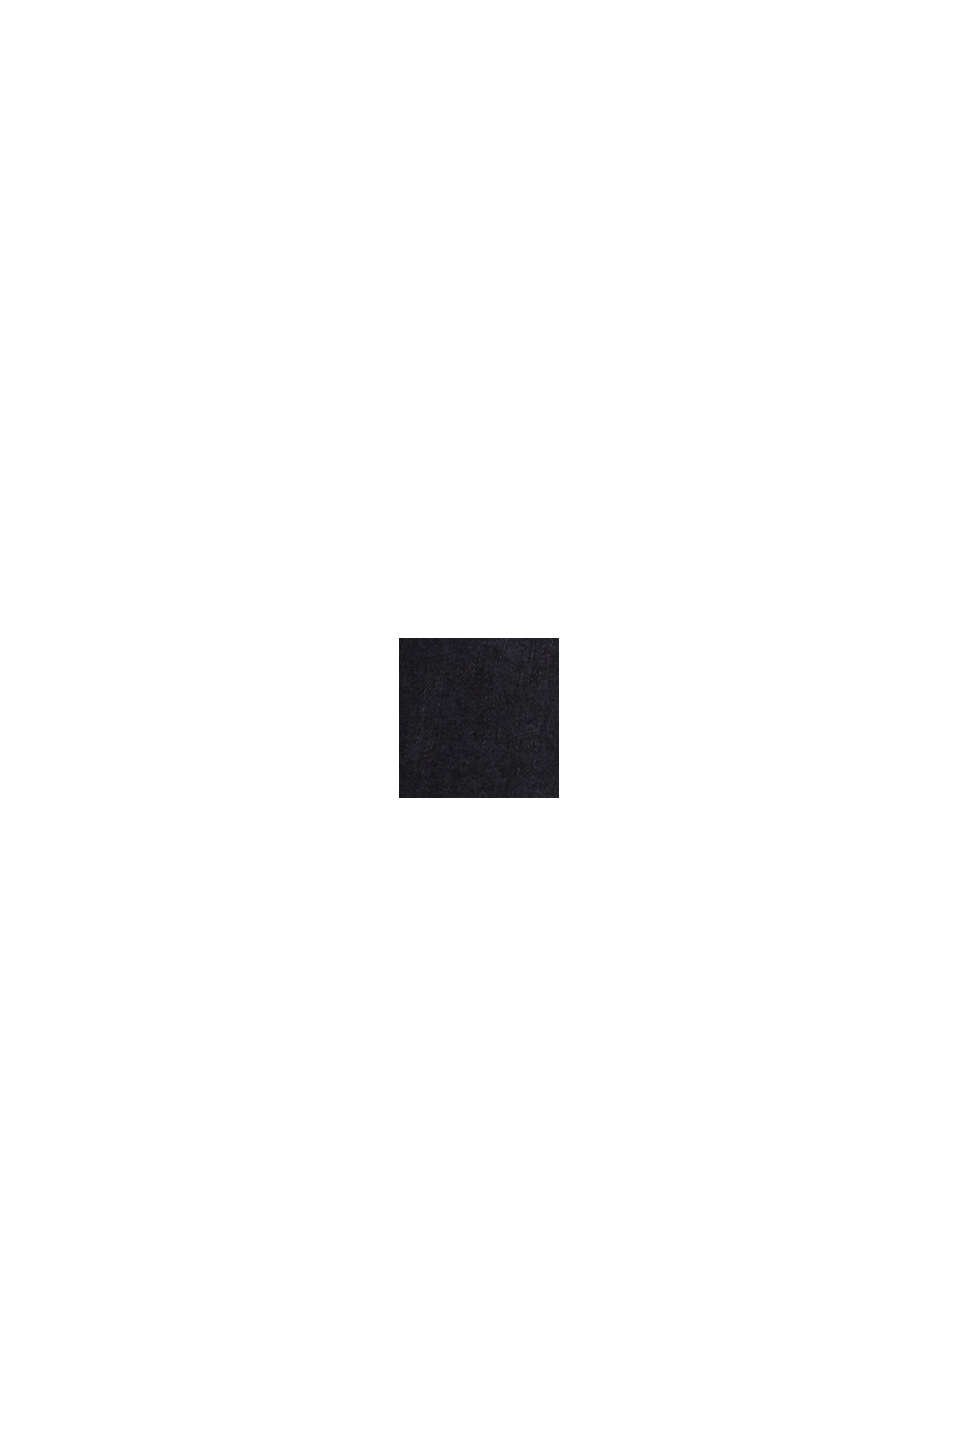 Stretchjeans met biologisch katoen, BLACK DARK WASHED, swatch